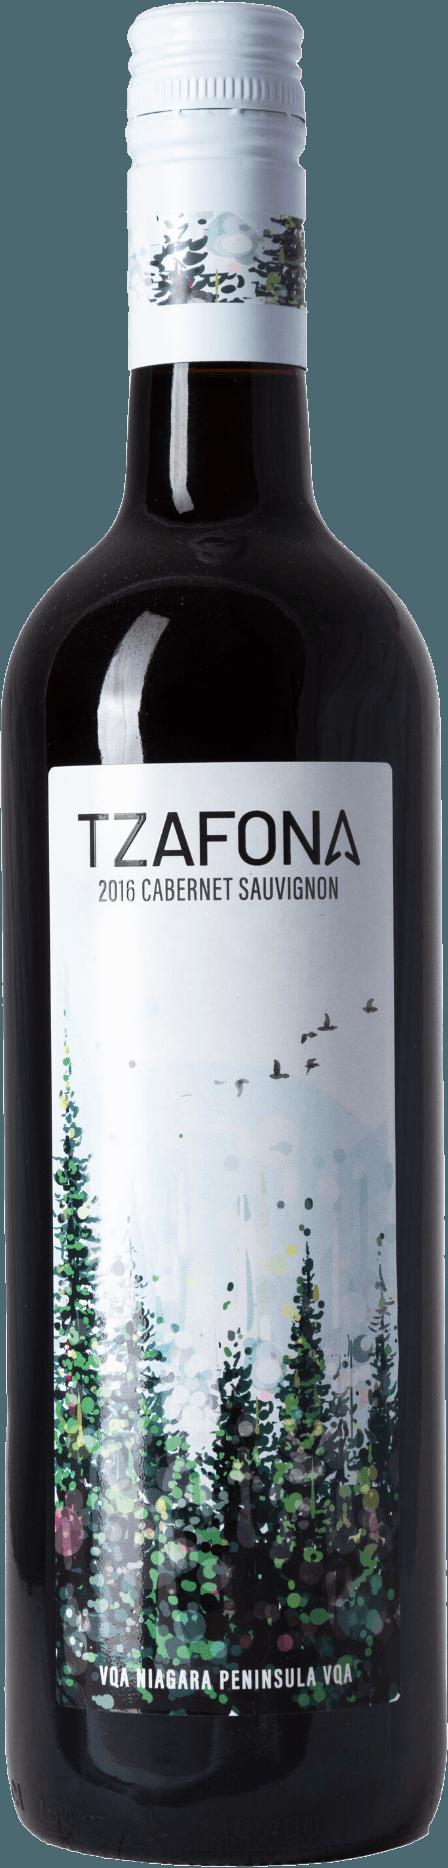 https://tzafona.com/wp-content/uploads/2021/10/tzafona_cabernet_sauvignon_icewine_2016.png